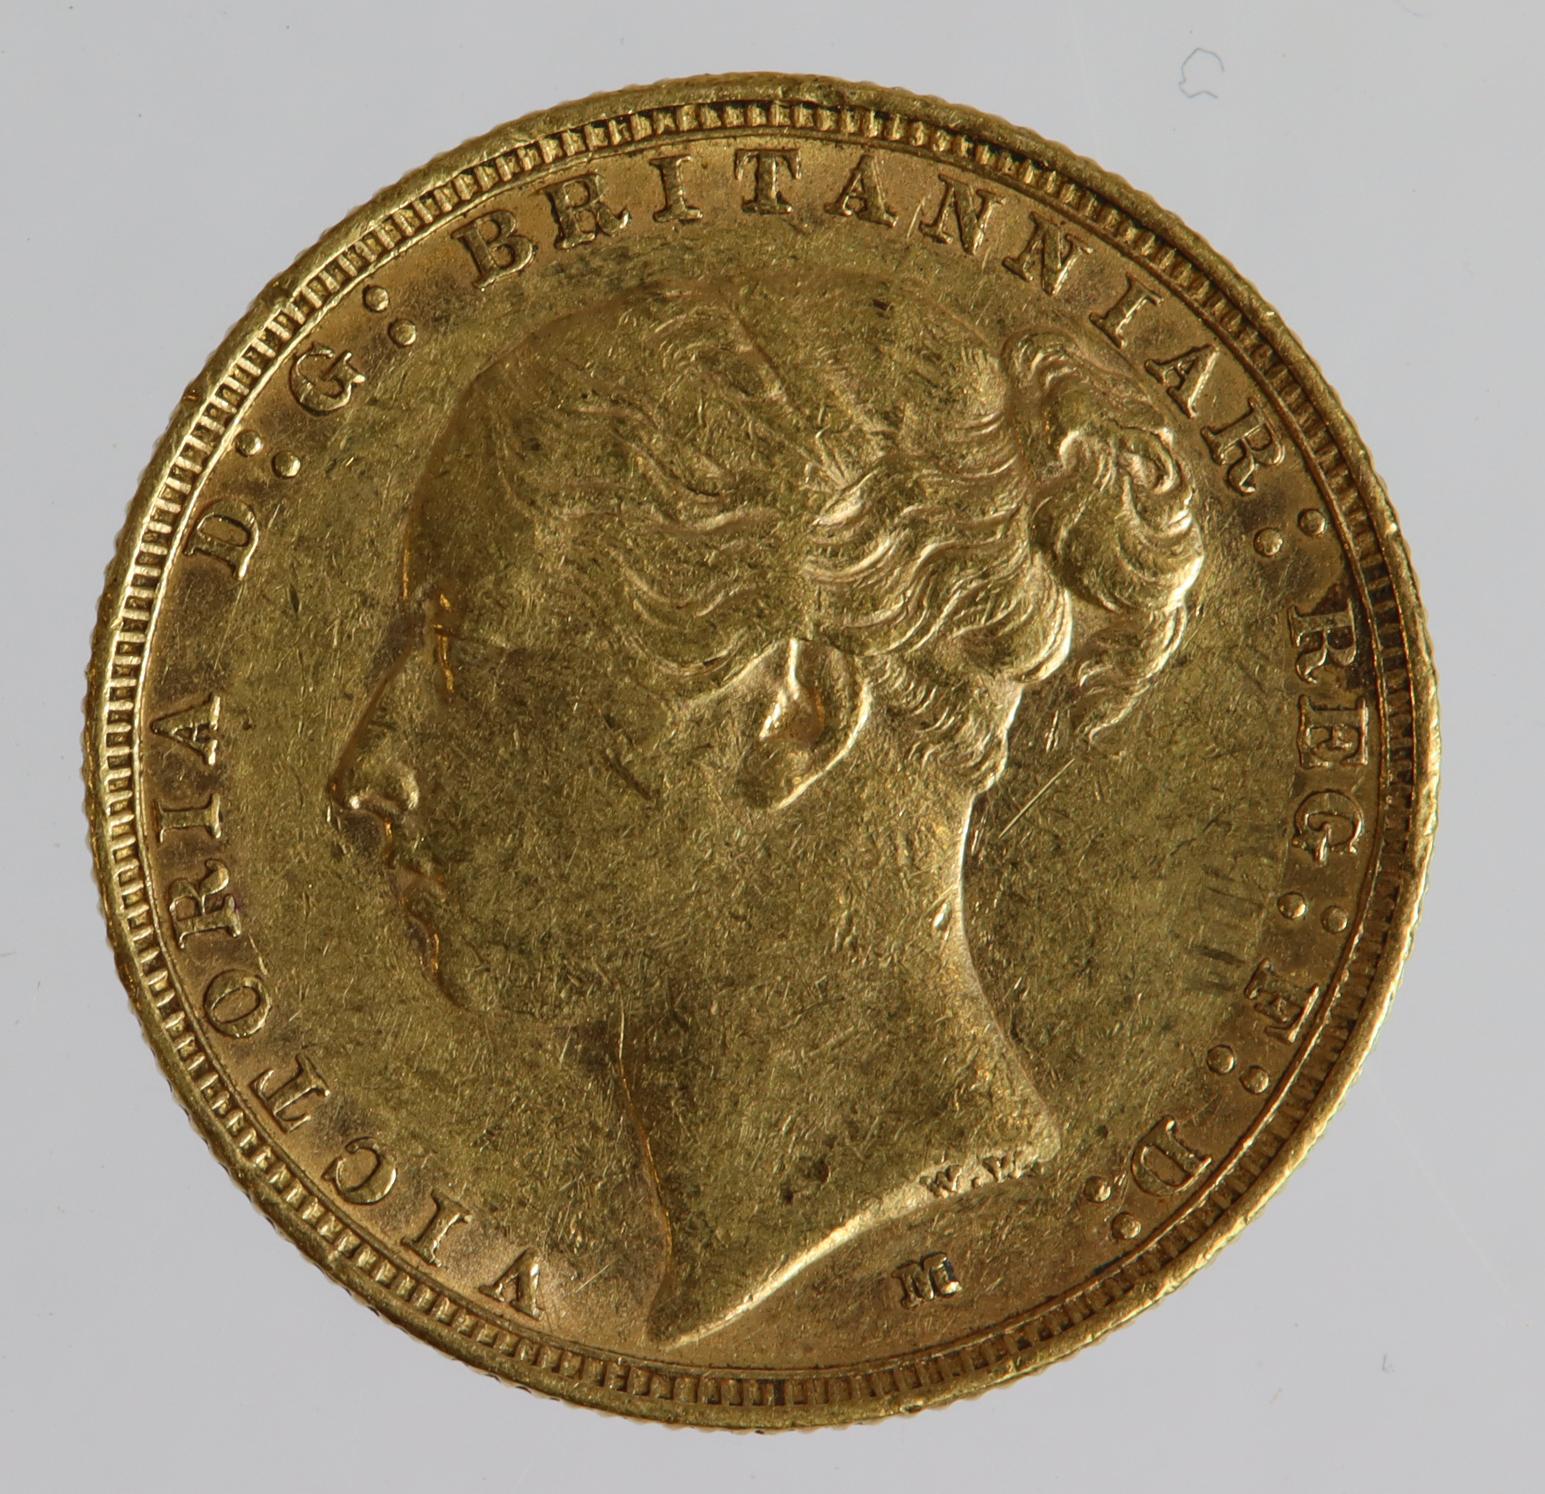 Sovereign 1886m (St George) VF